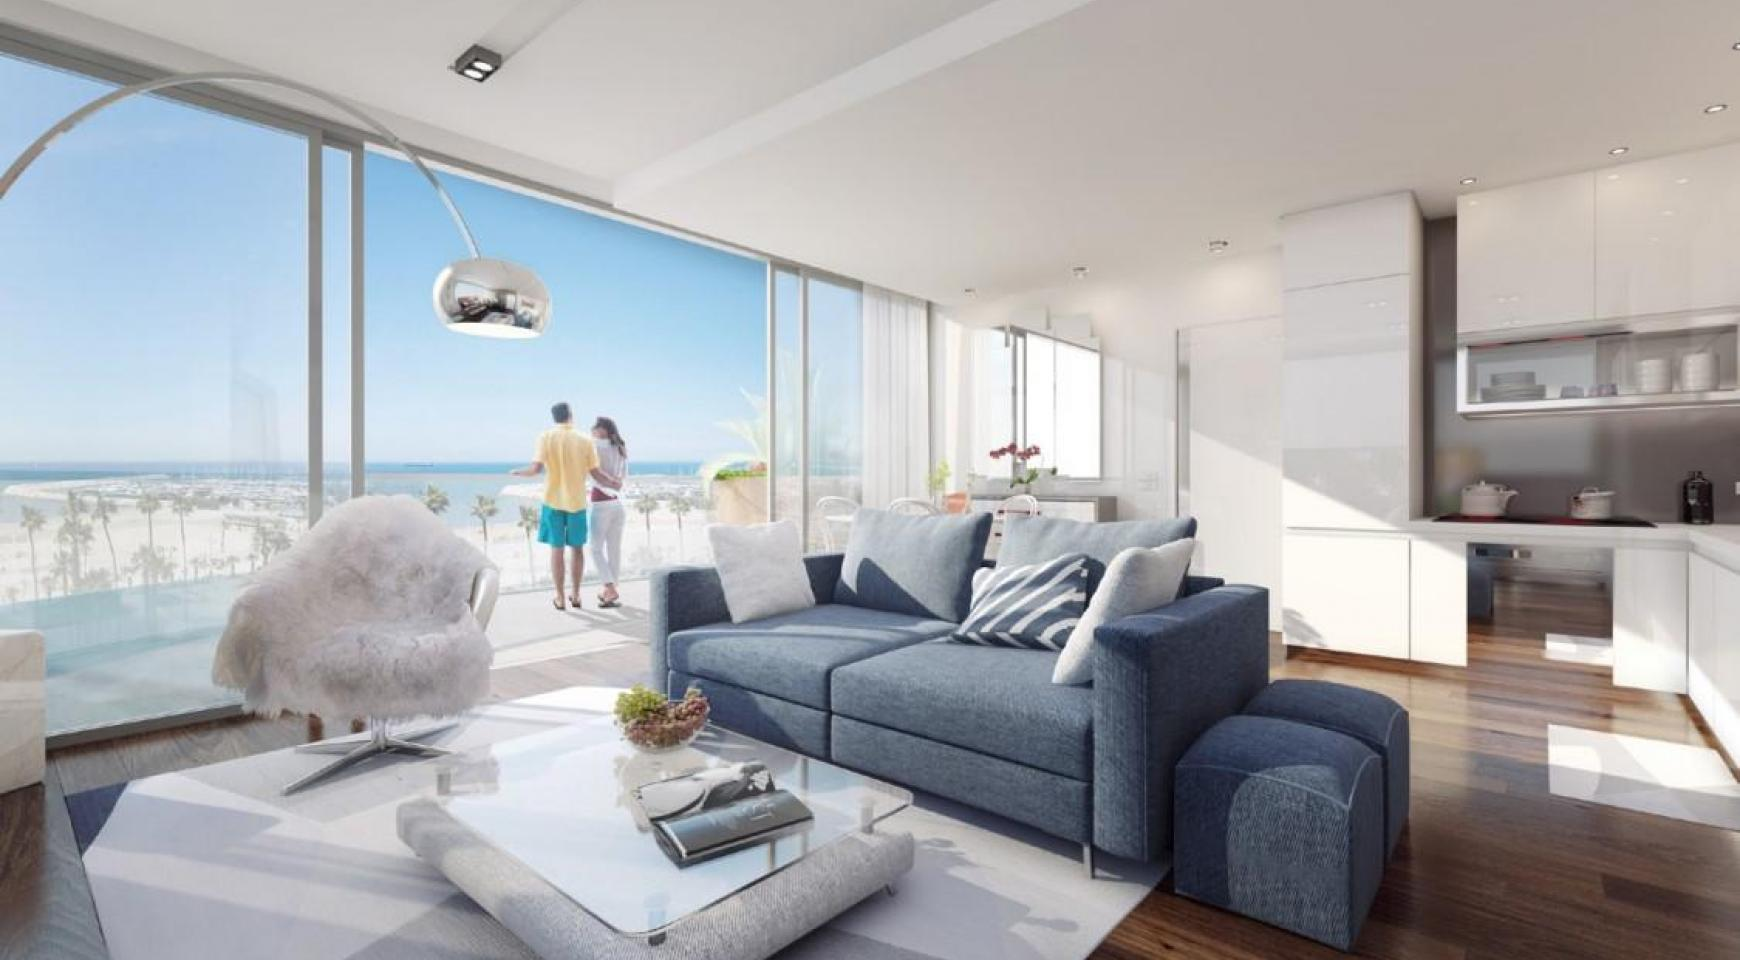 New 3 Bedroom Apartment near the Sea - 7